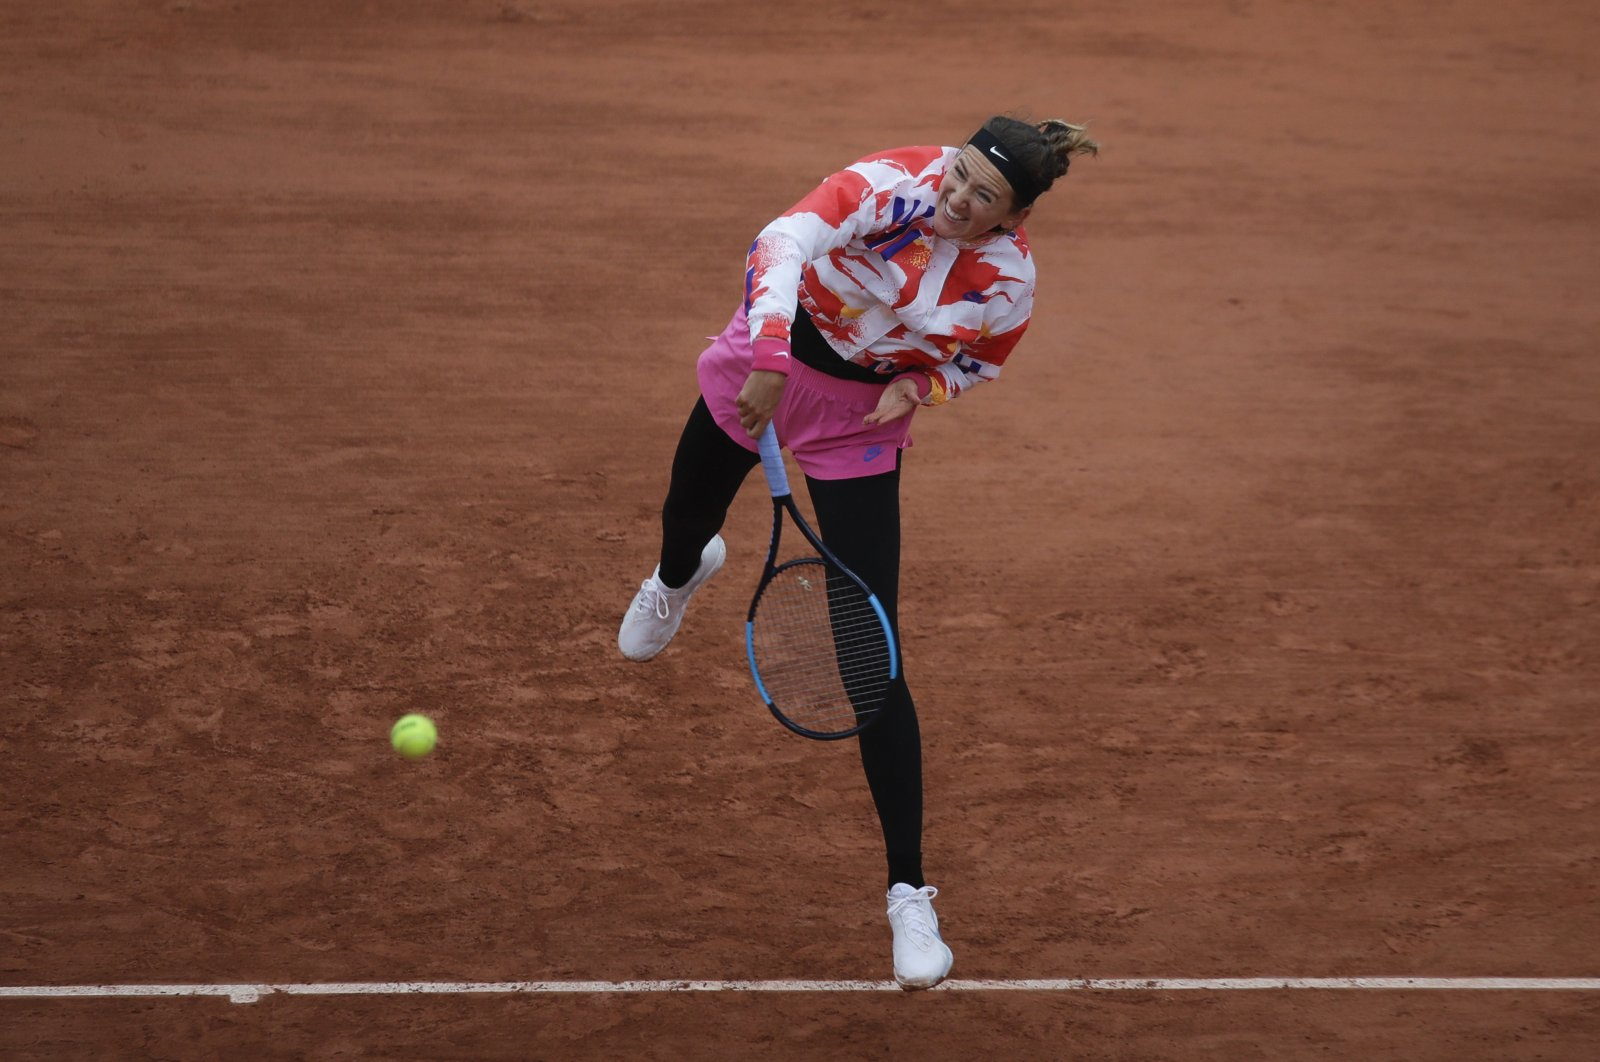 Victoria Azarenka serves in a match against Danka Kovinic, in Paris, France, Sept. 27, 2020. (AP Photo)